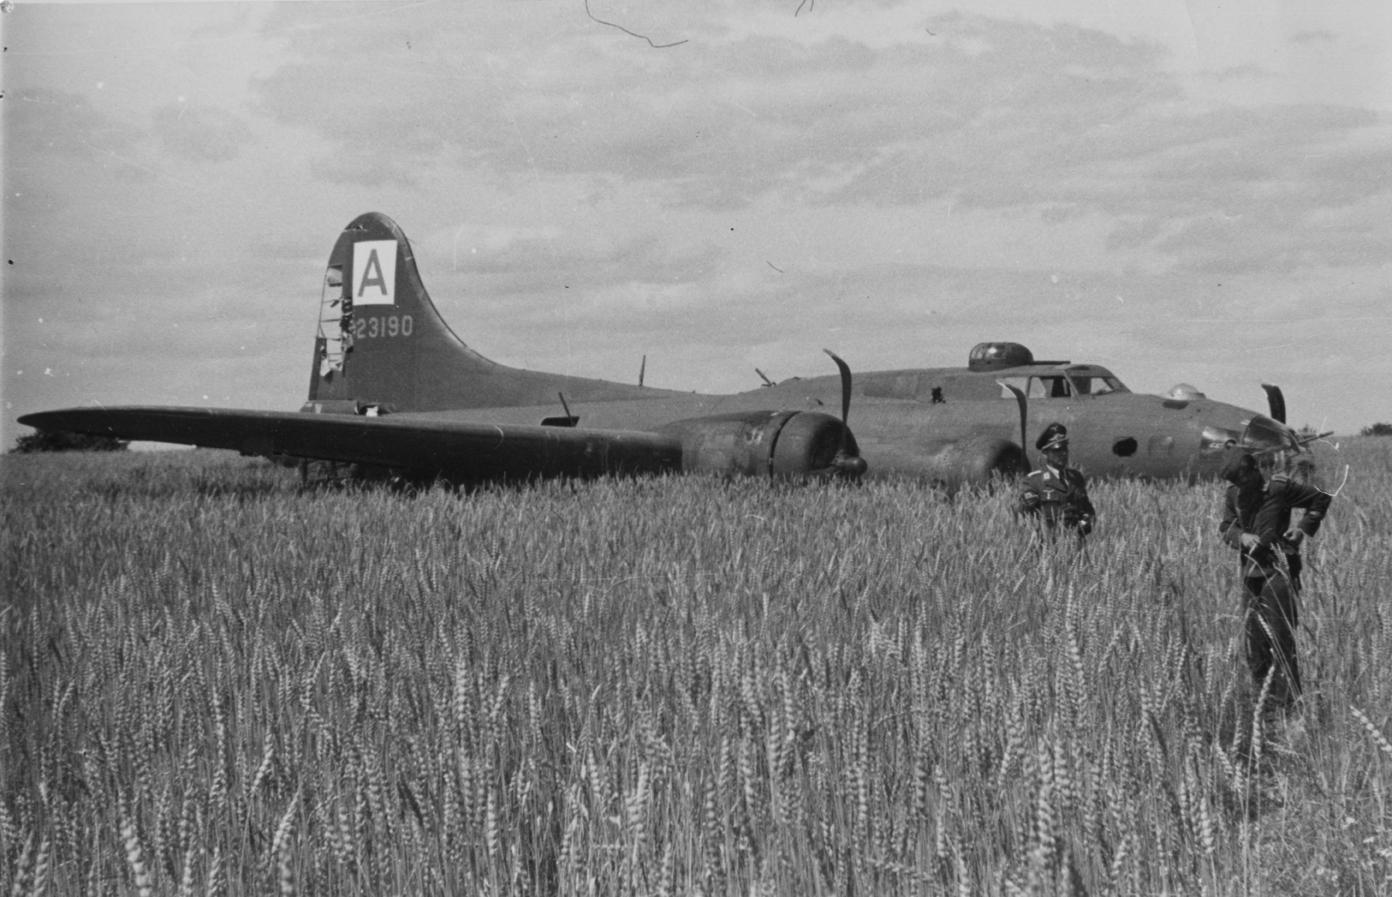 B-17 42-3190